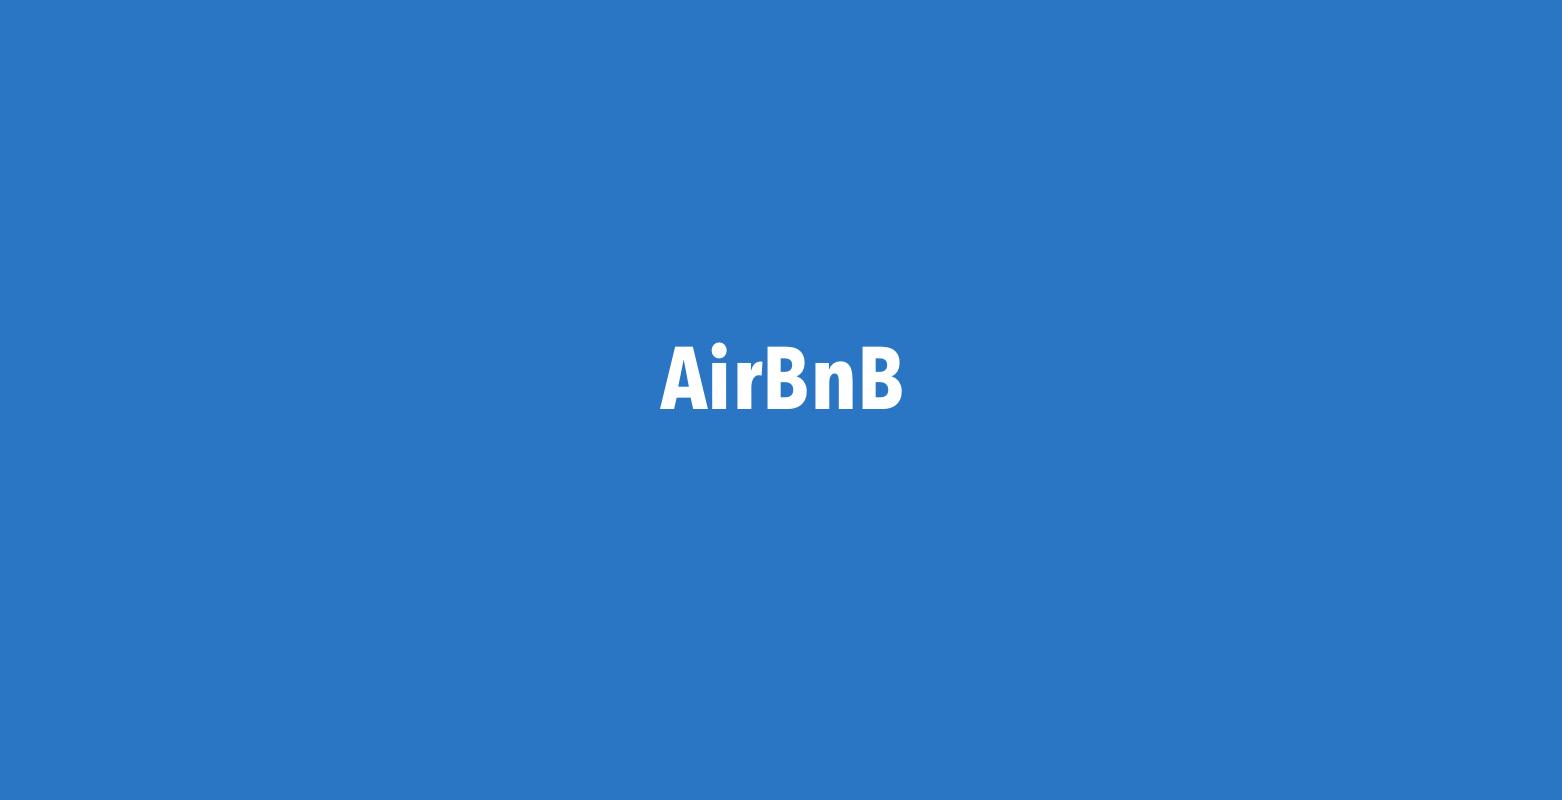 Fremleje via AirBnB